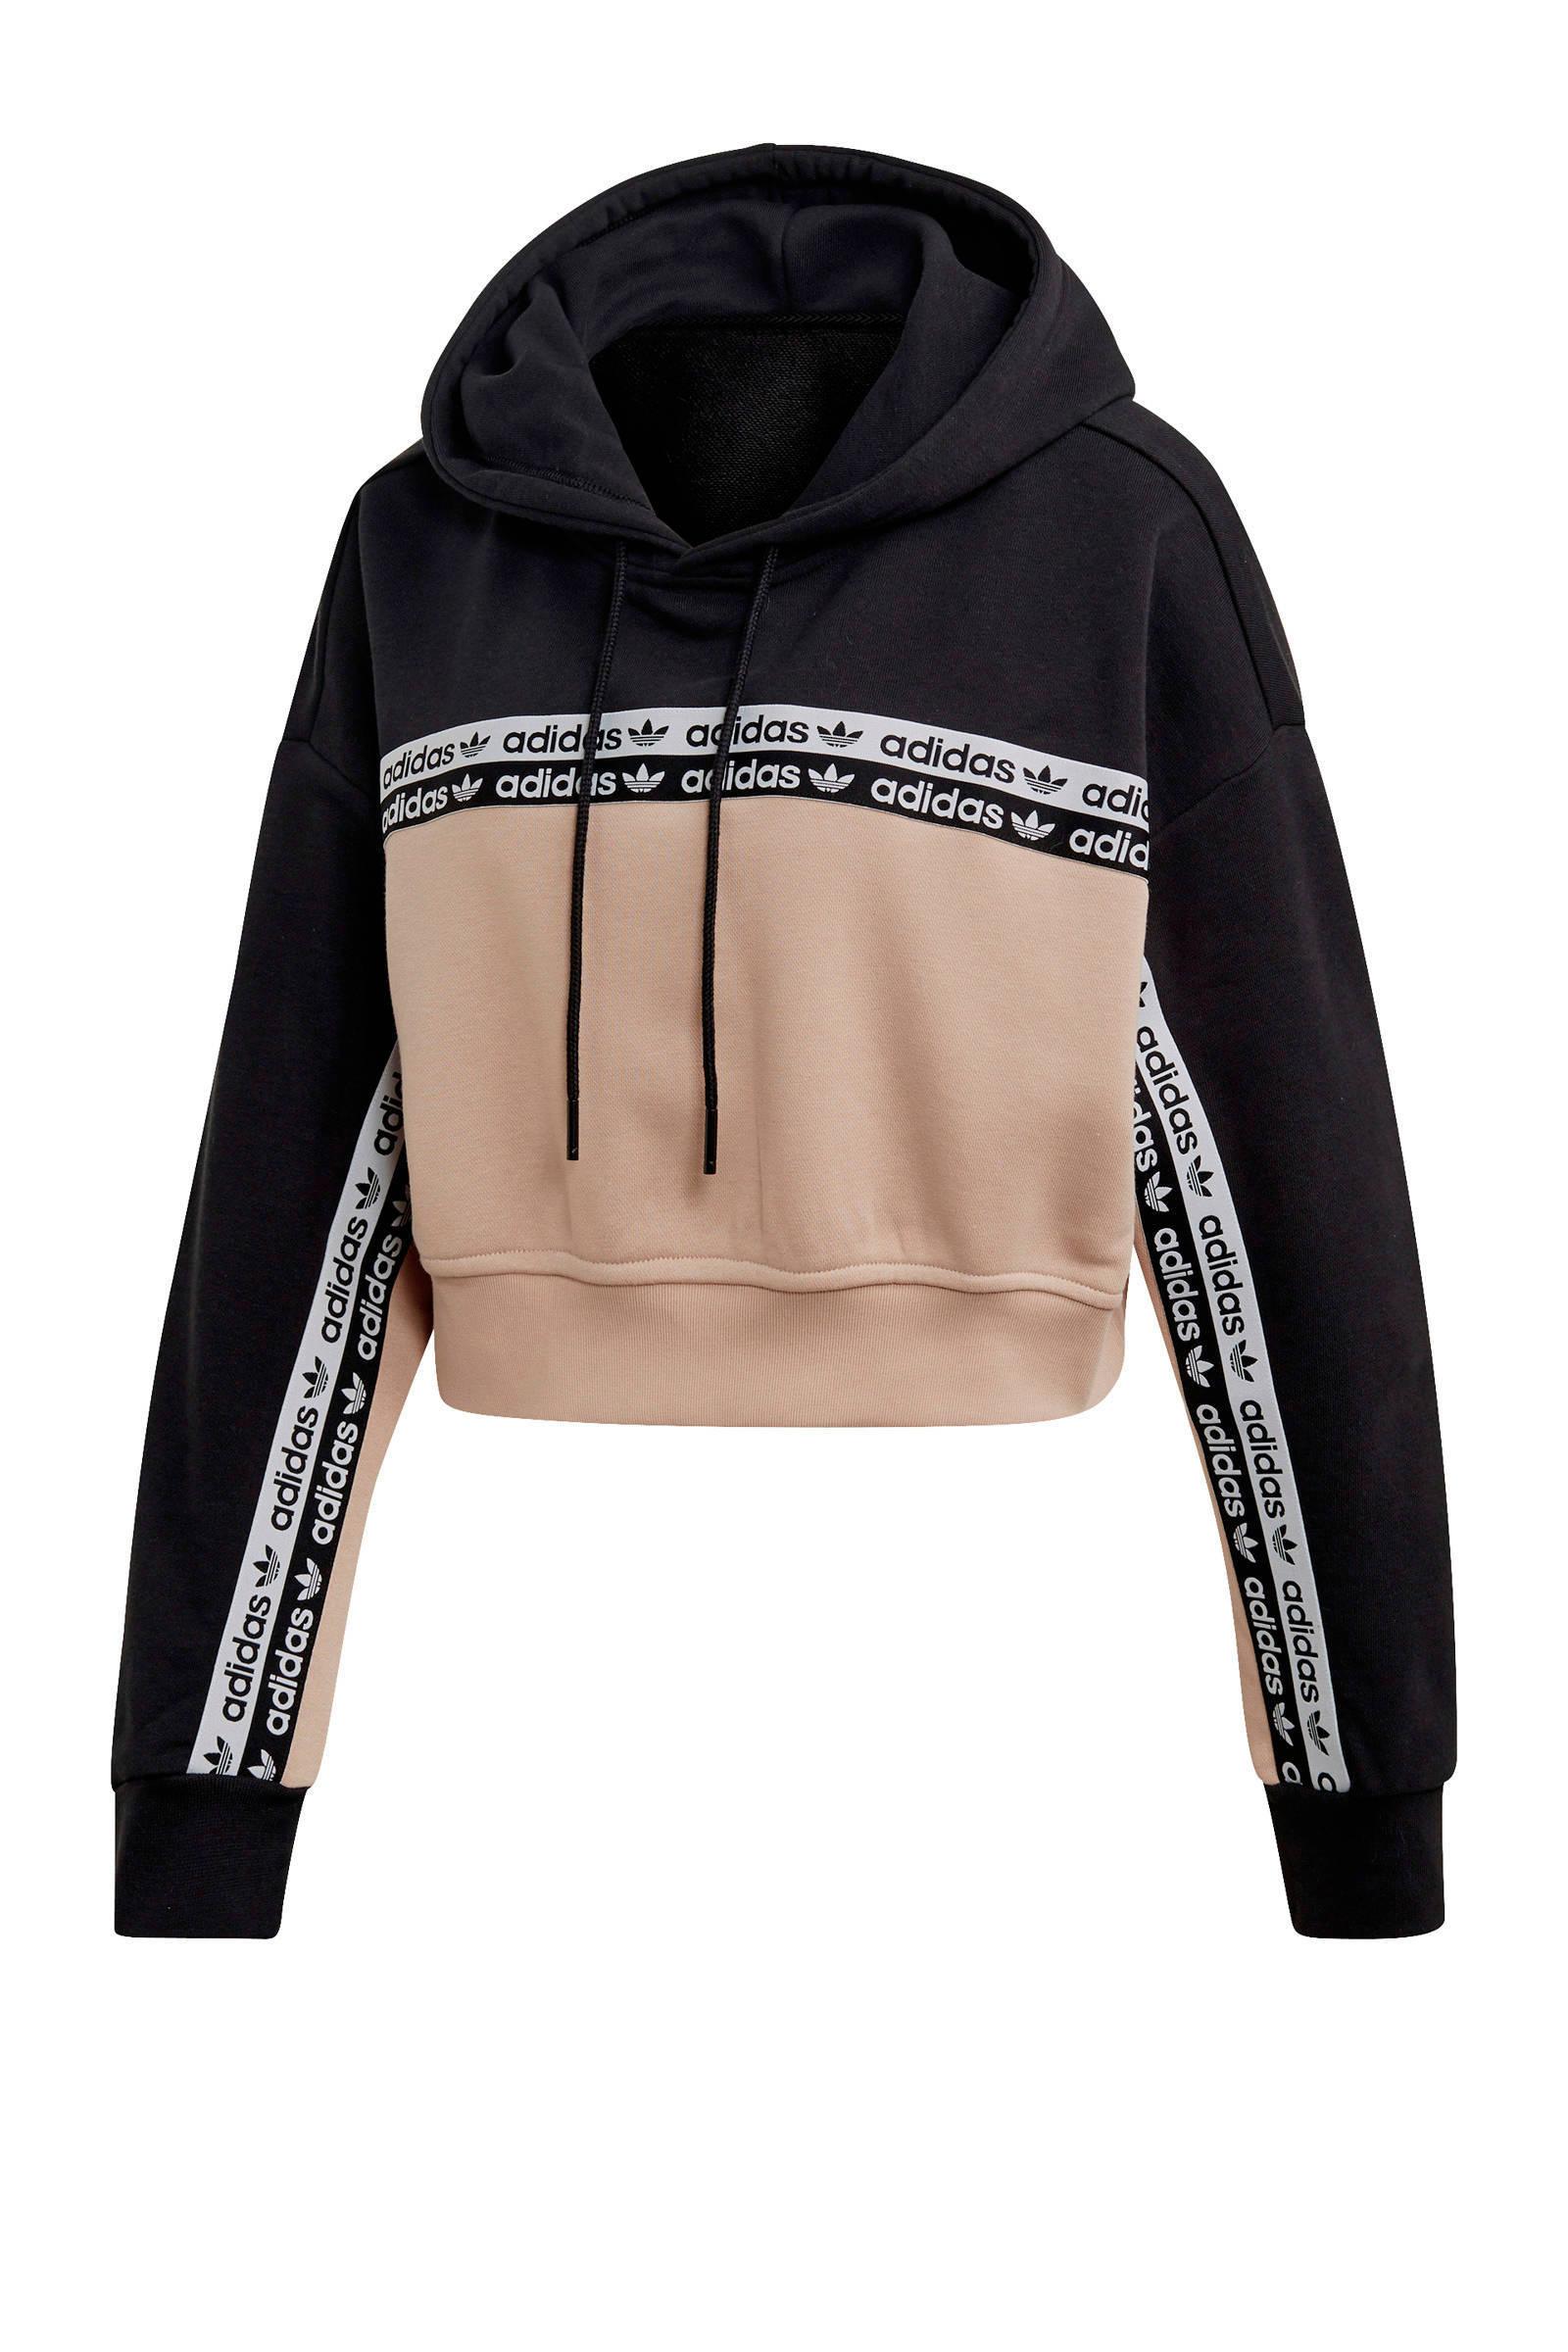 adidas Originals hoodie zwartoudroze   wehkamp